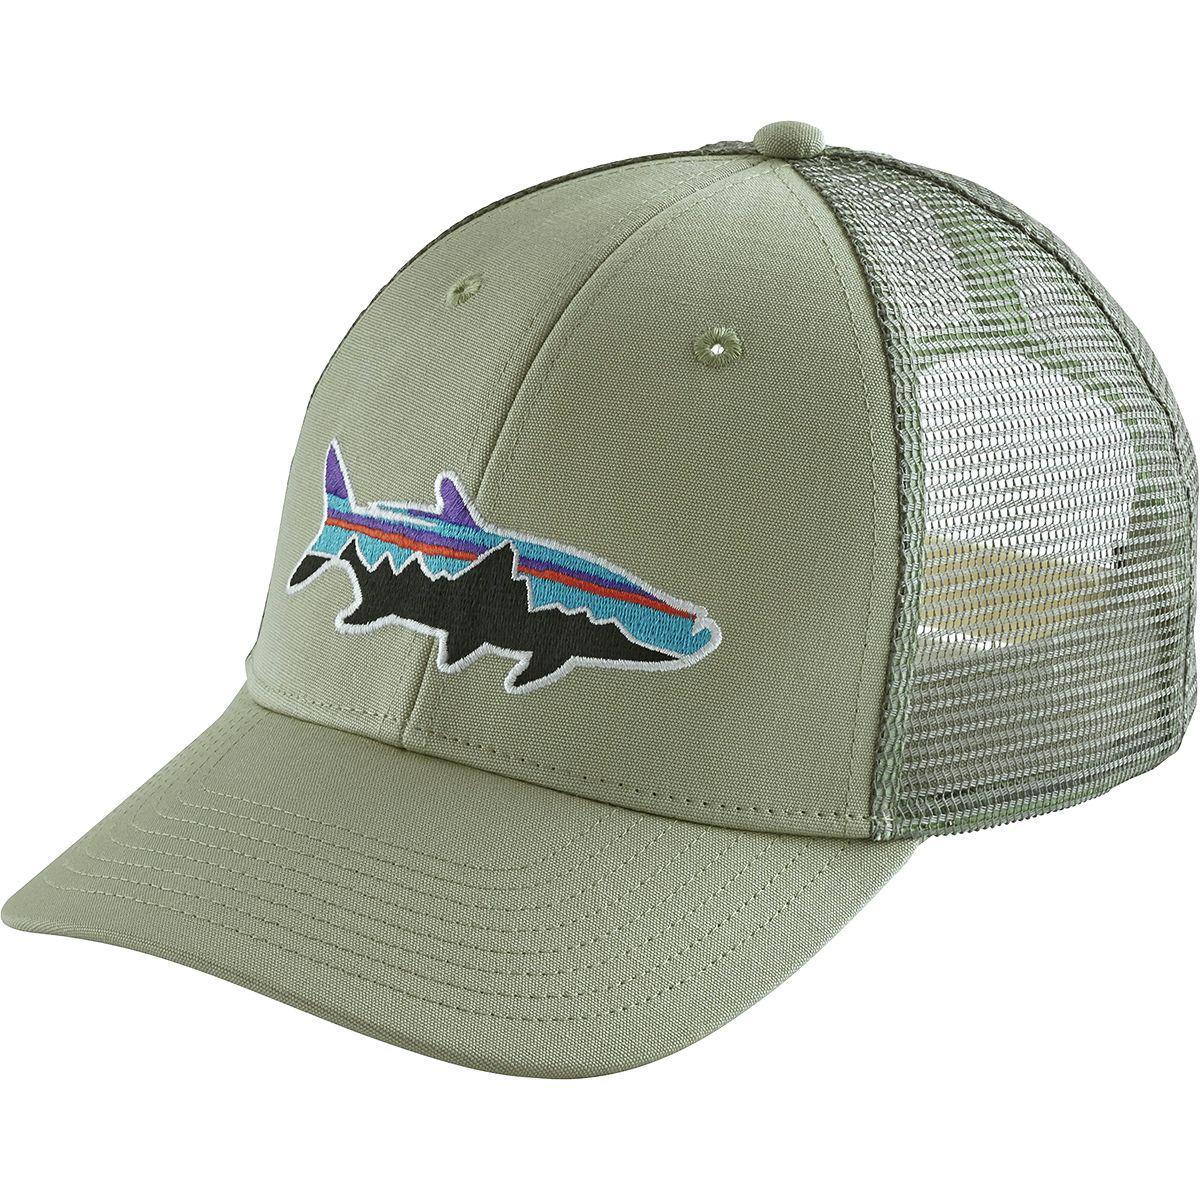 2343c340 Lyst - Patagonia Fitz Roy Tarpon Lopro Trucker Hat in Green for Men